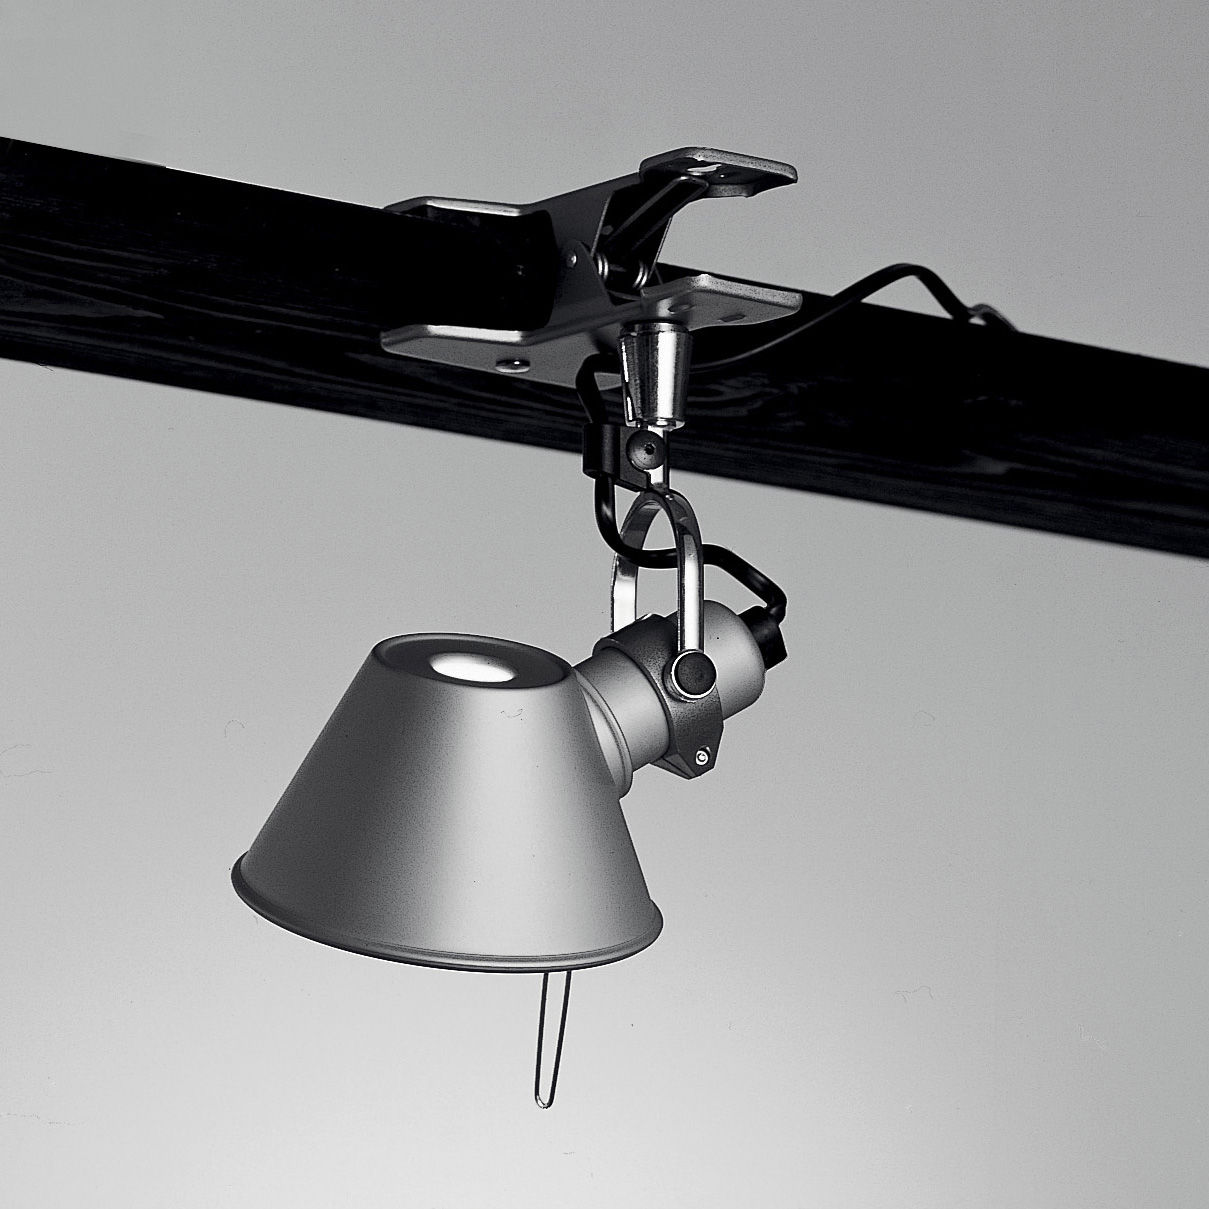 Luminaire - Appliques - Spot à pince Tolomeo Micro Pinza LED - Artemide - H 20 cm - Aluminium - Acier, Aluminium